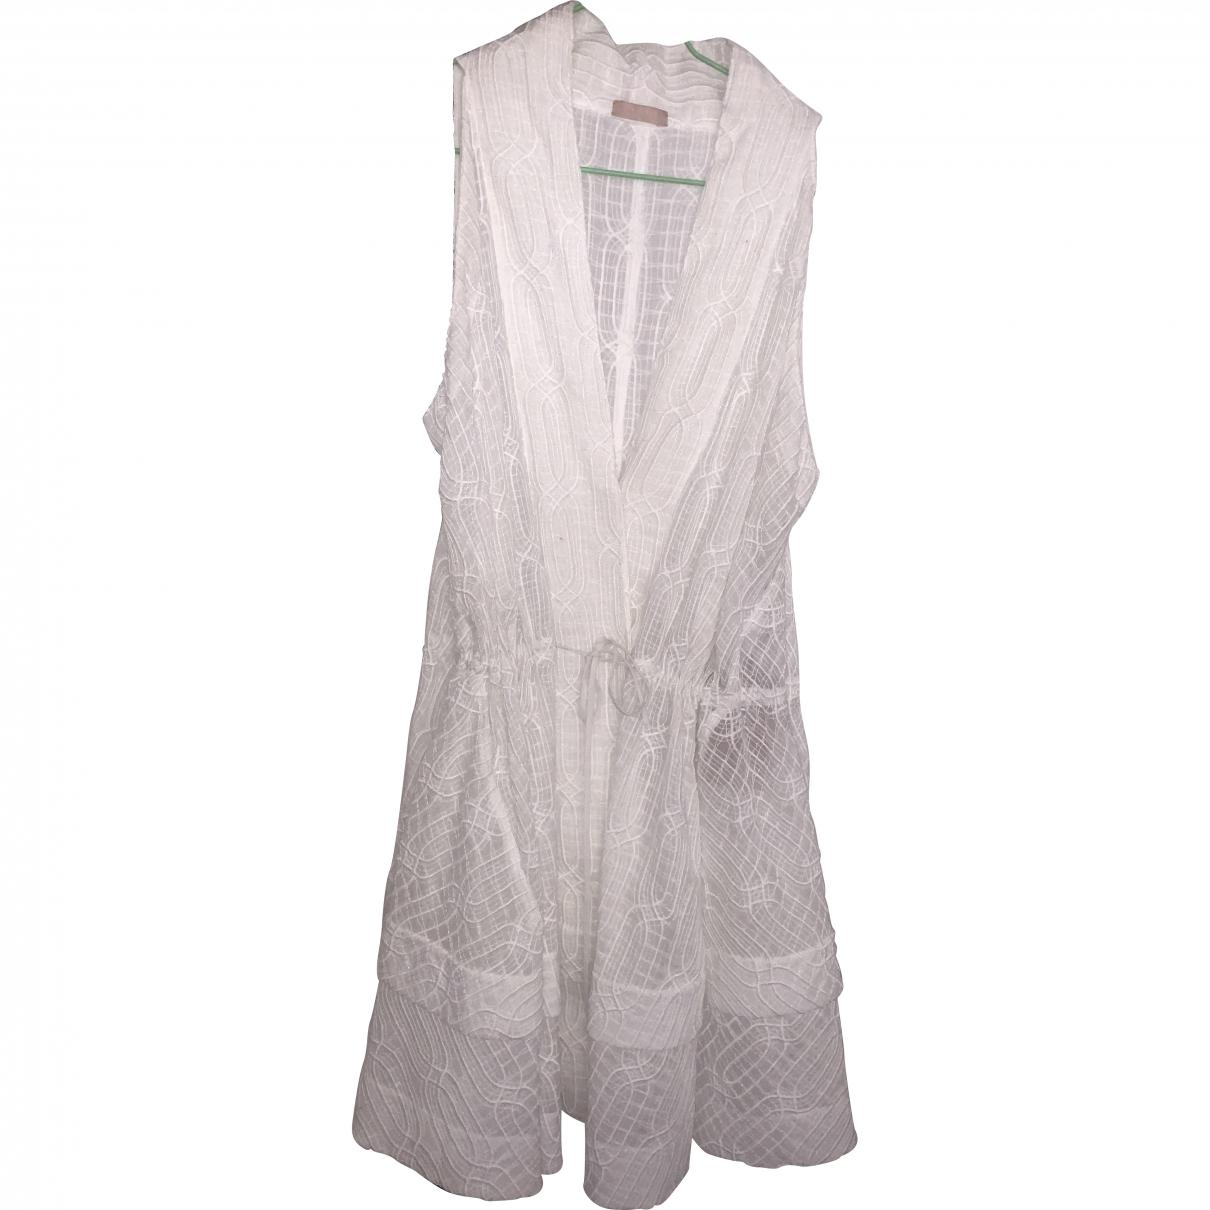 Alaïa \N White Cotton dress for Women 36 FR